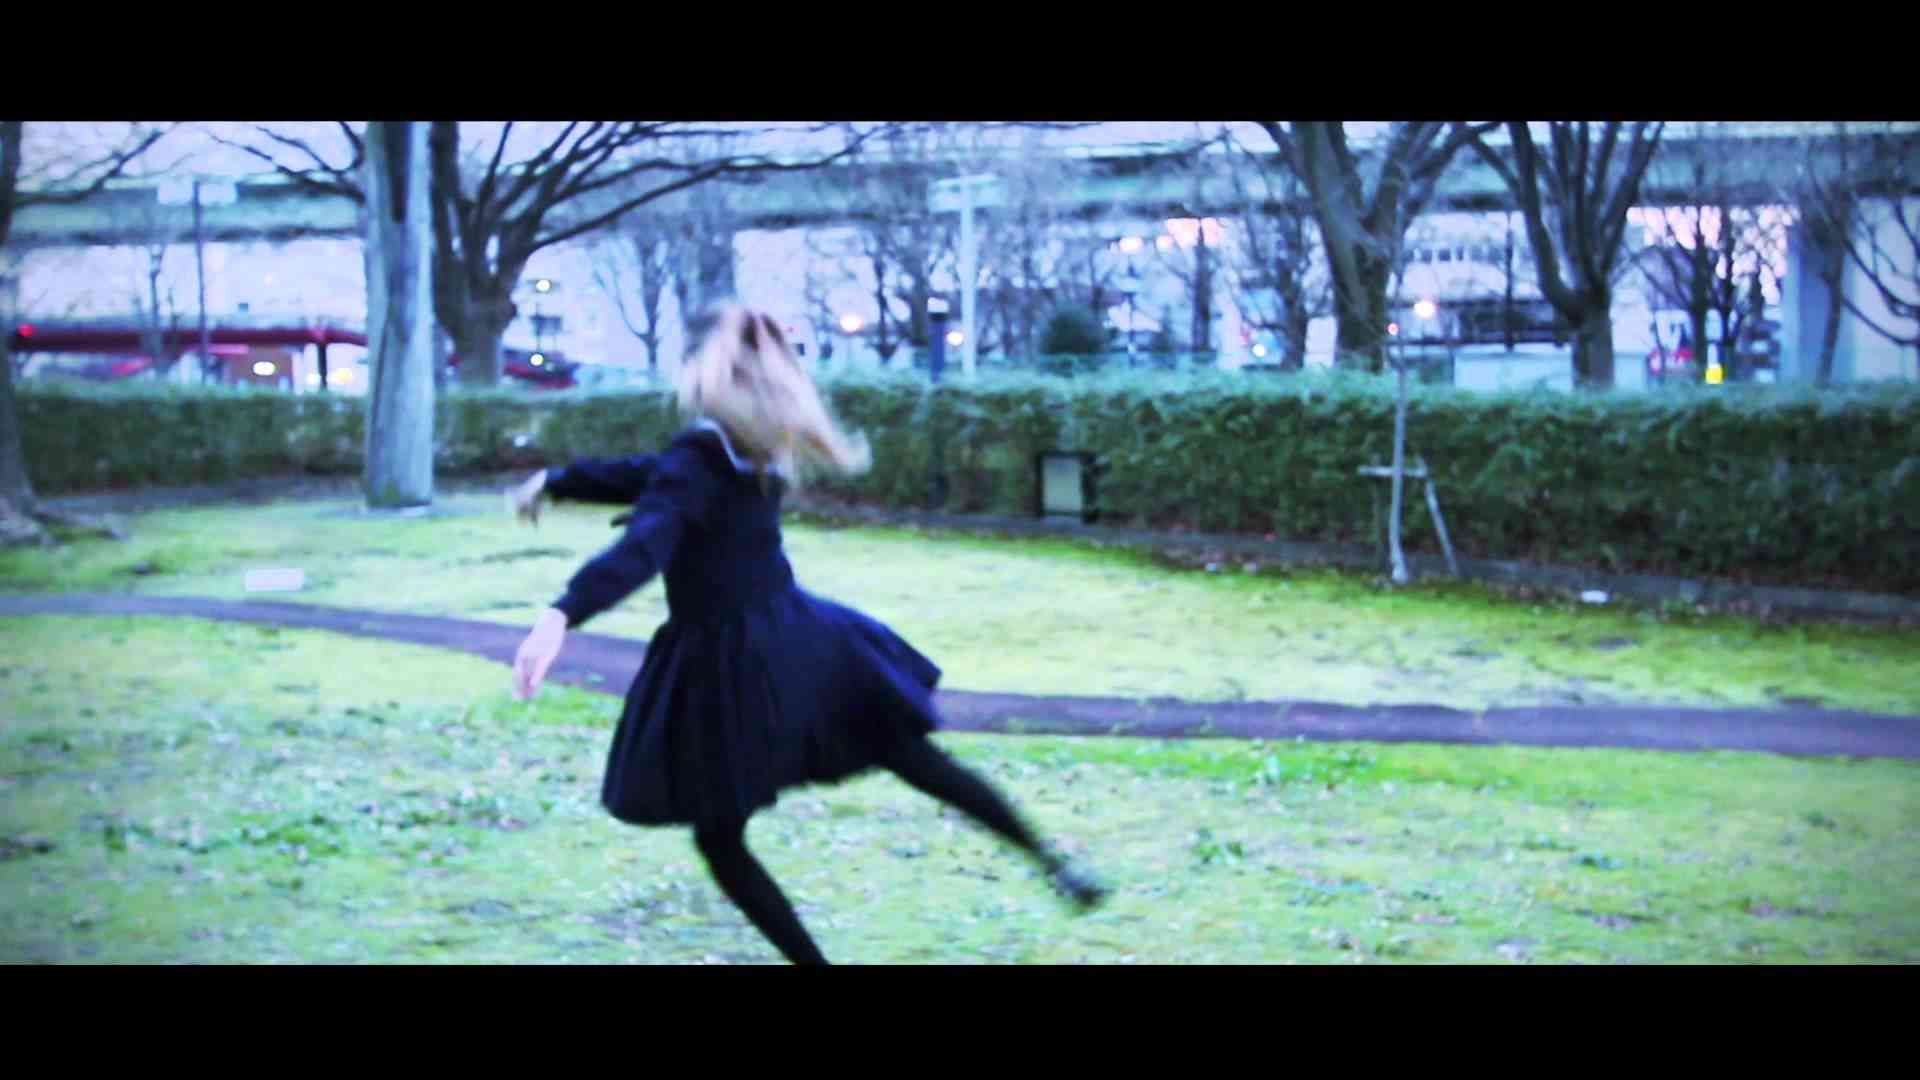 【MV】bUd - daoko - YouTube